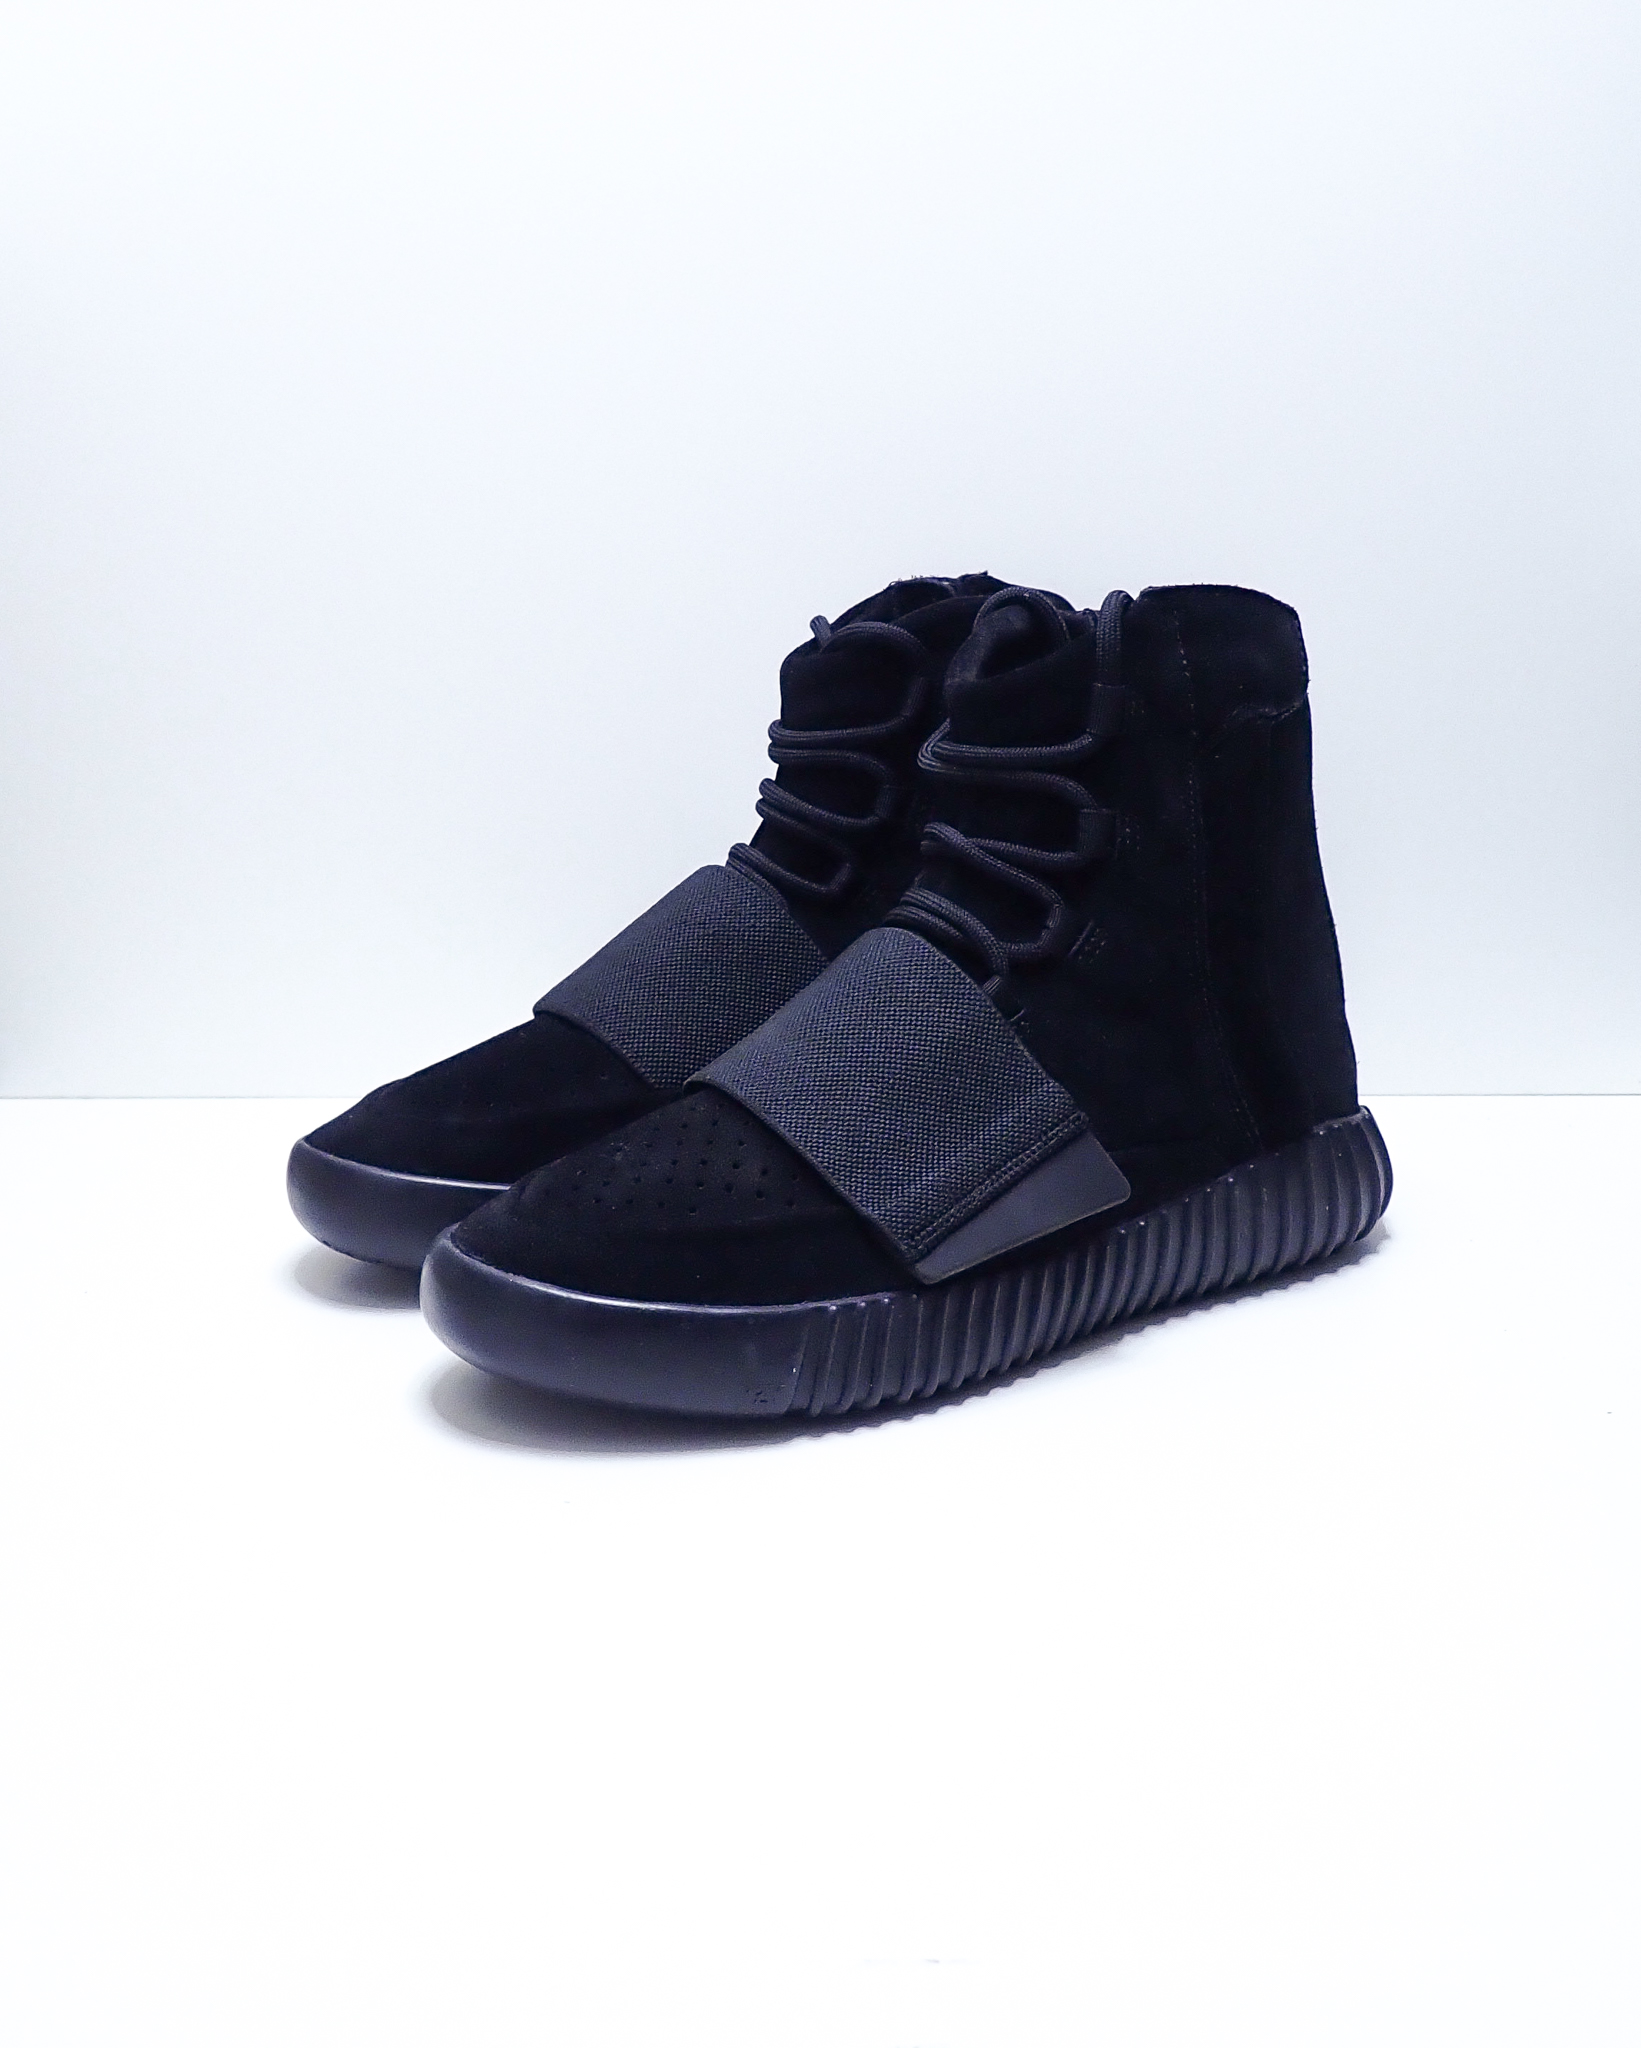 Adidas Yeezy 750 Boost Triple Black